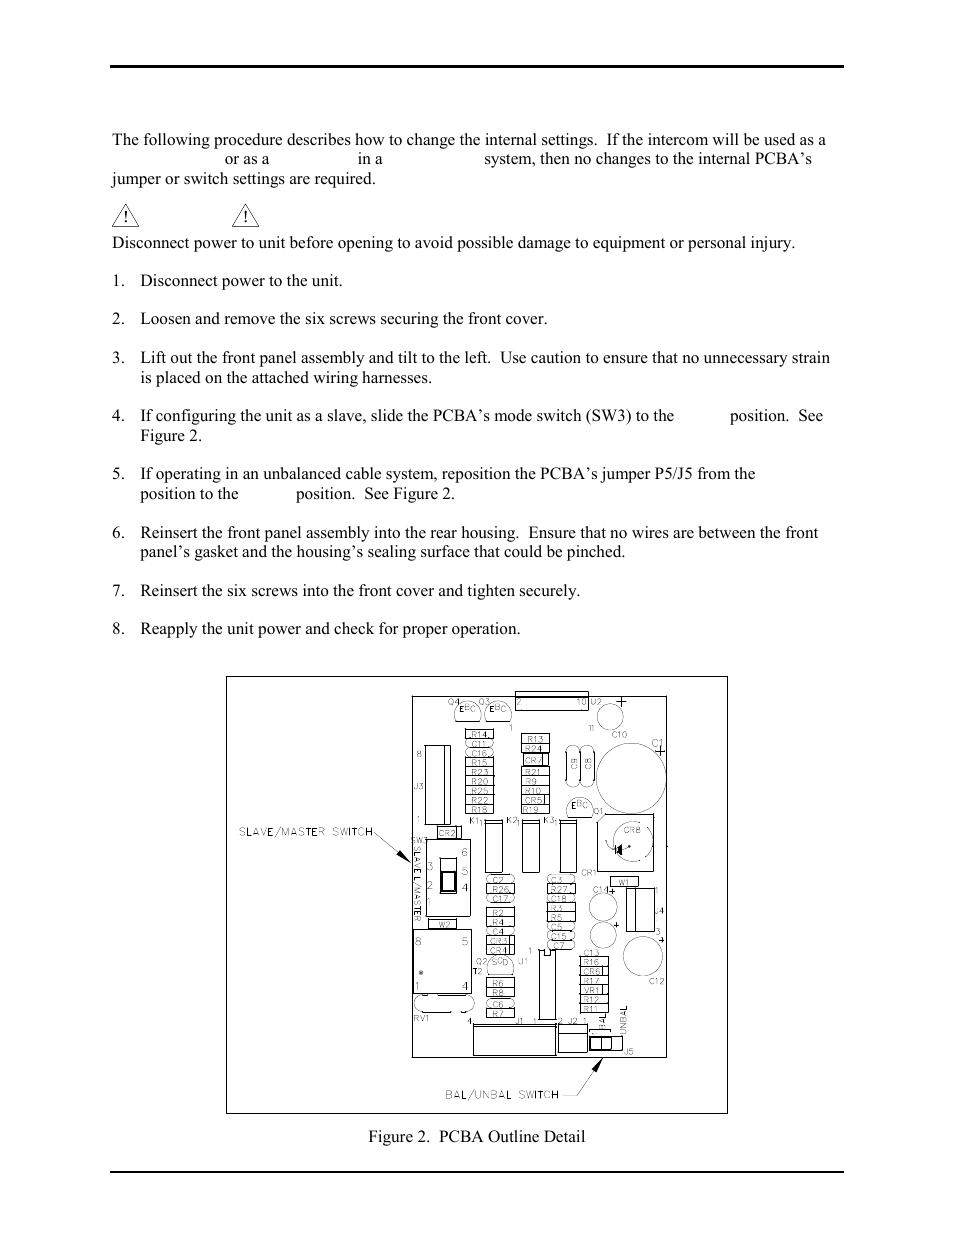 Internal Settings Gai Tronics Gc Ac1 Ez Page Industrial Intercom Switch Wiring Diagram User Manual